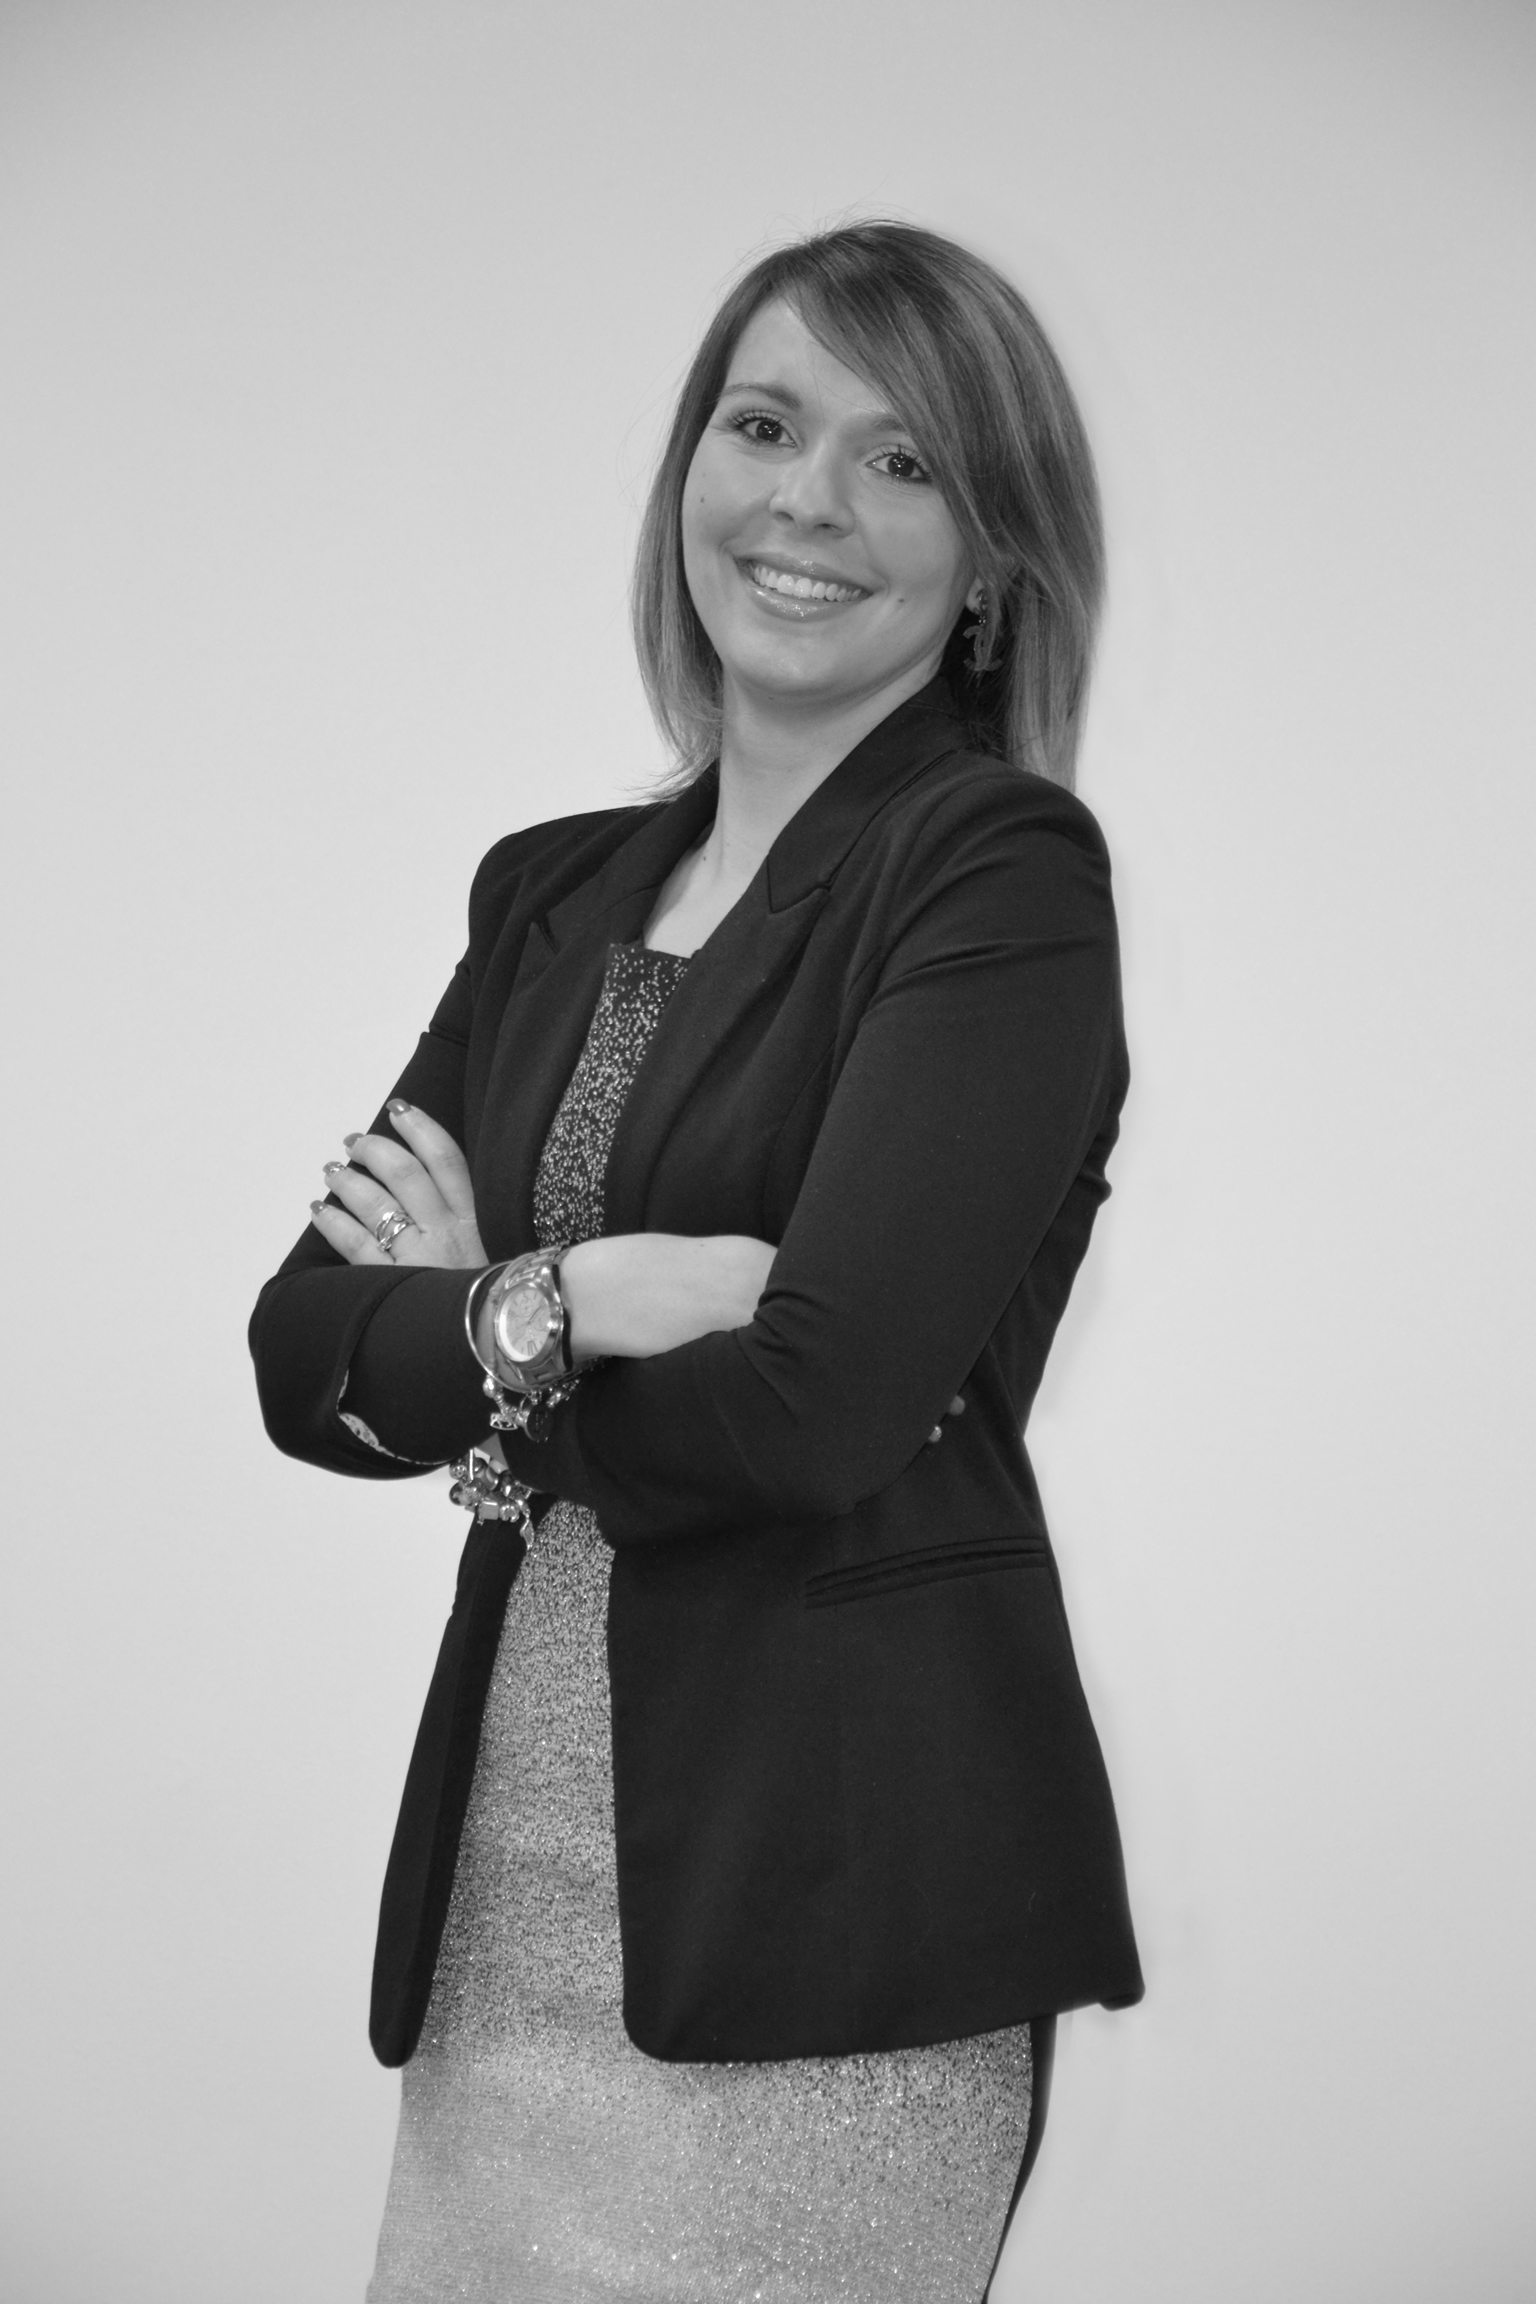 Francesca Luchino